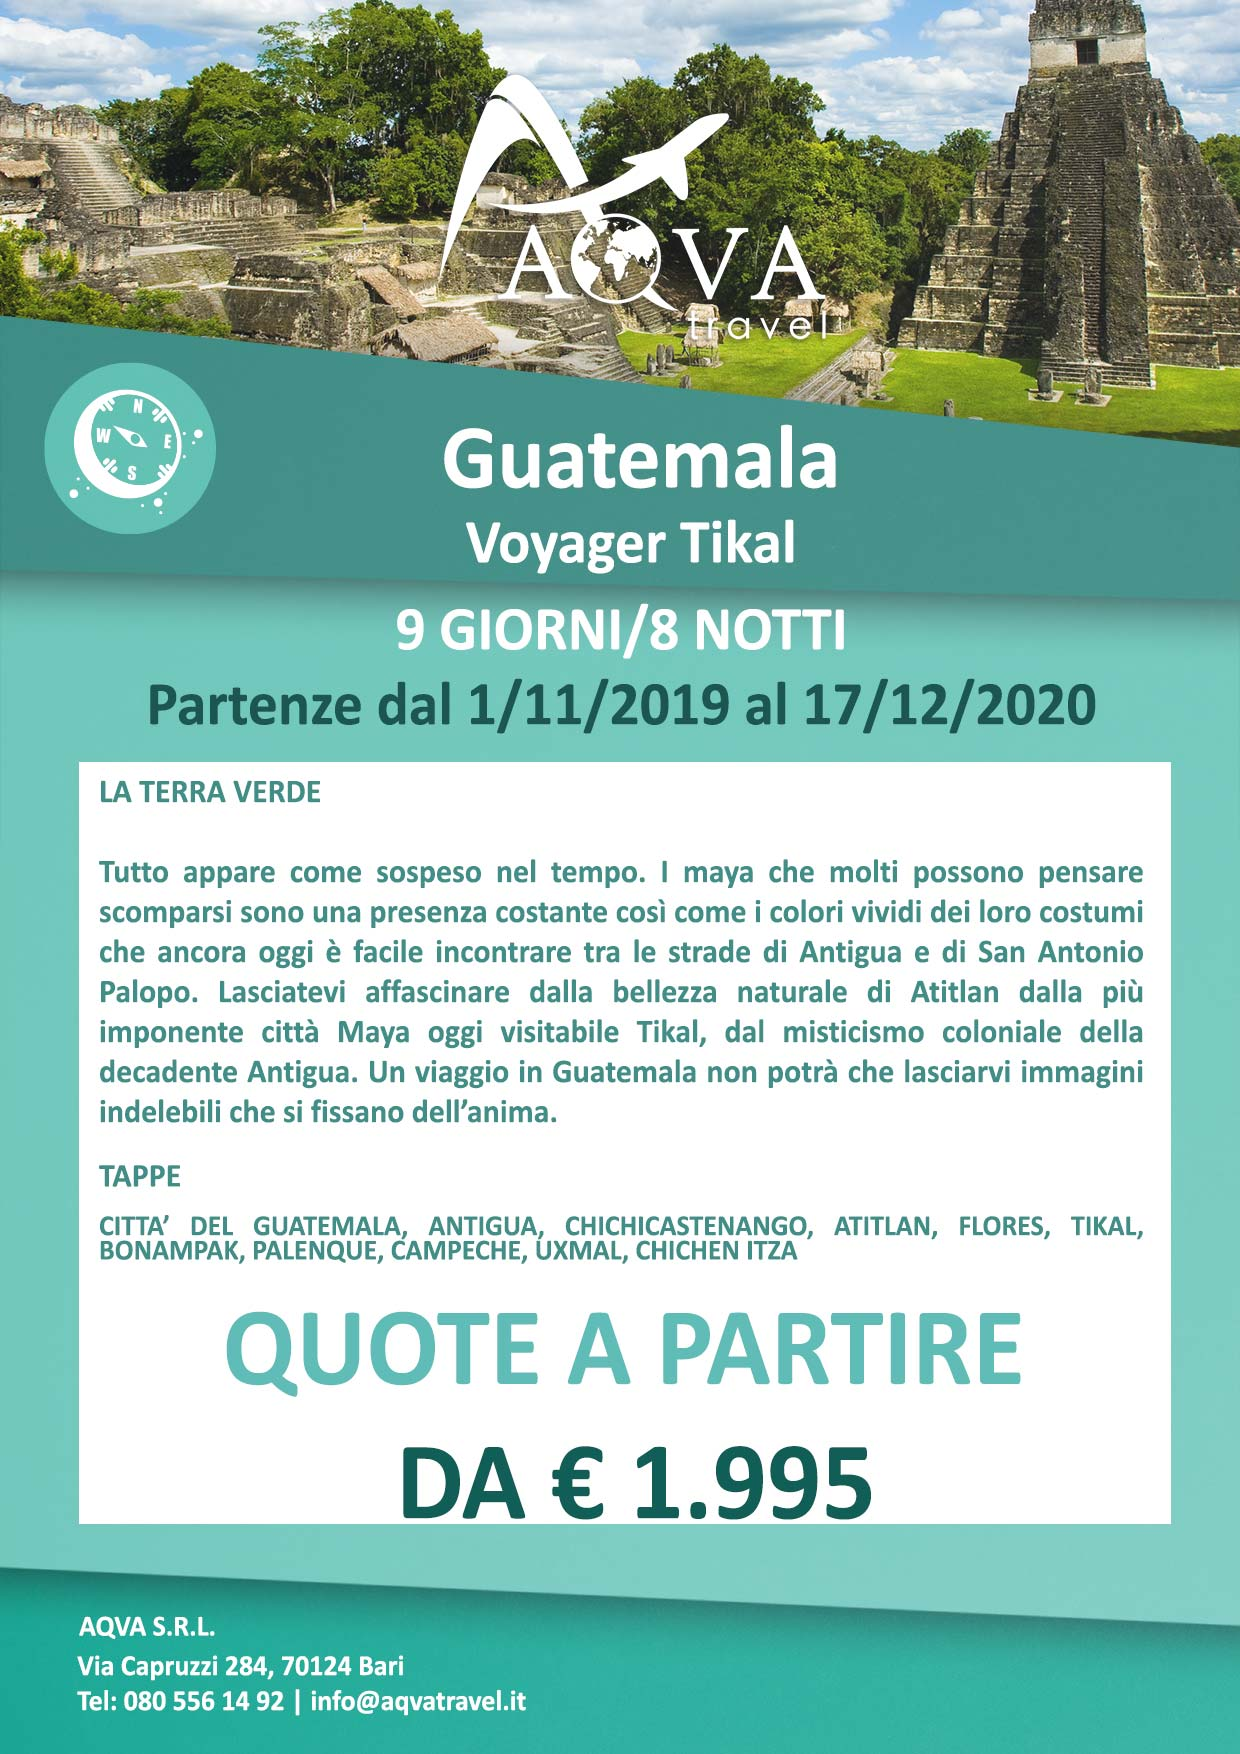 Guatemala-Tikal-9-GIORNI-8-NOTTI-Avventura-offerte-agenzia-di-viaggi-Bari-AQVATRAVEL-it